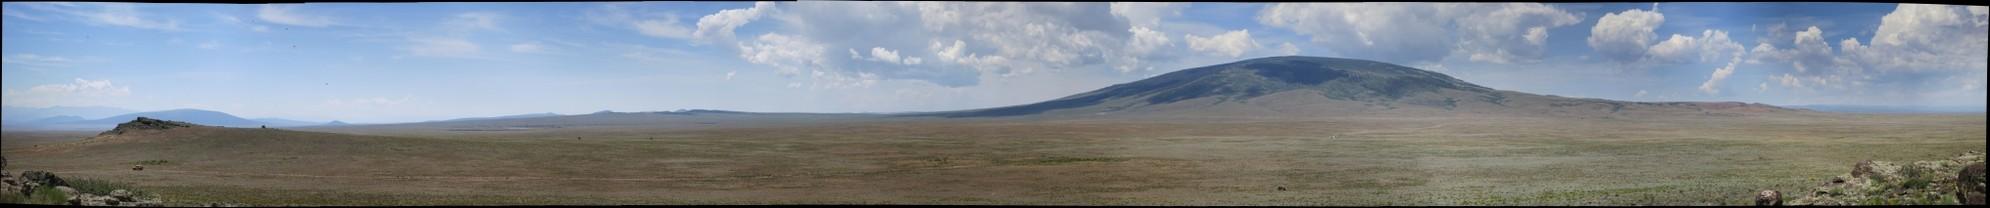 San Antonio Mountain, Rio Arriba County, NM, July 2014